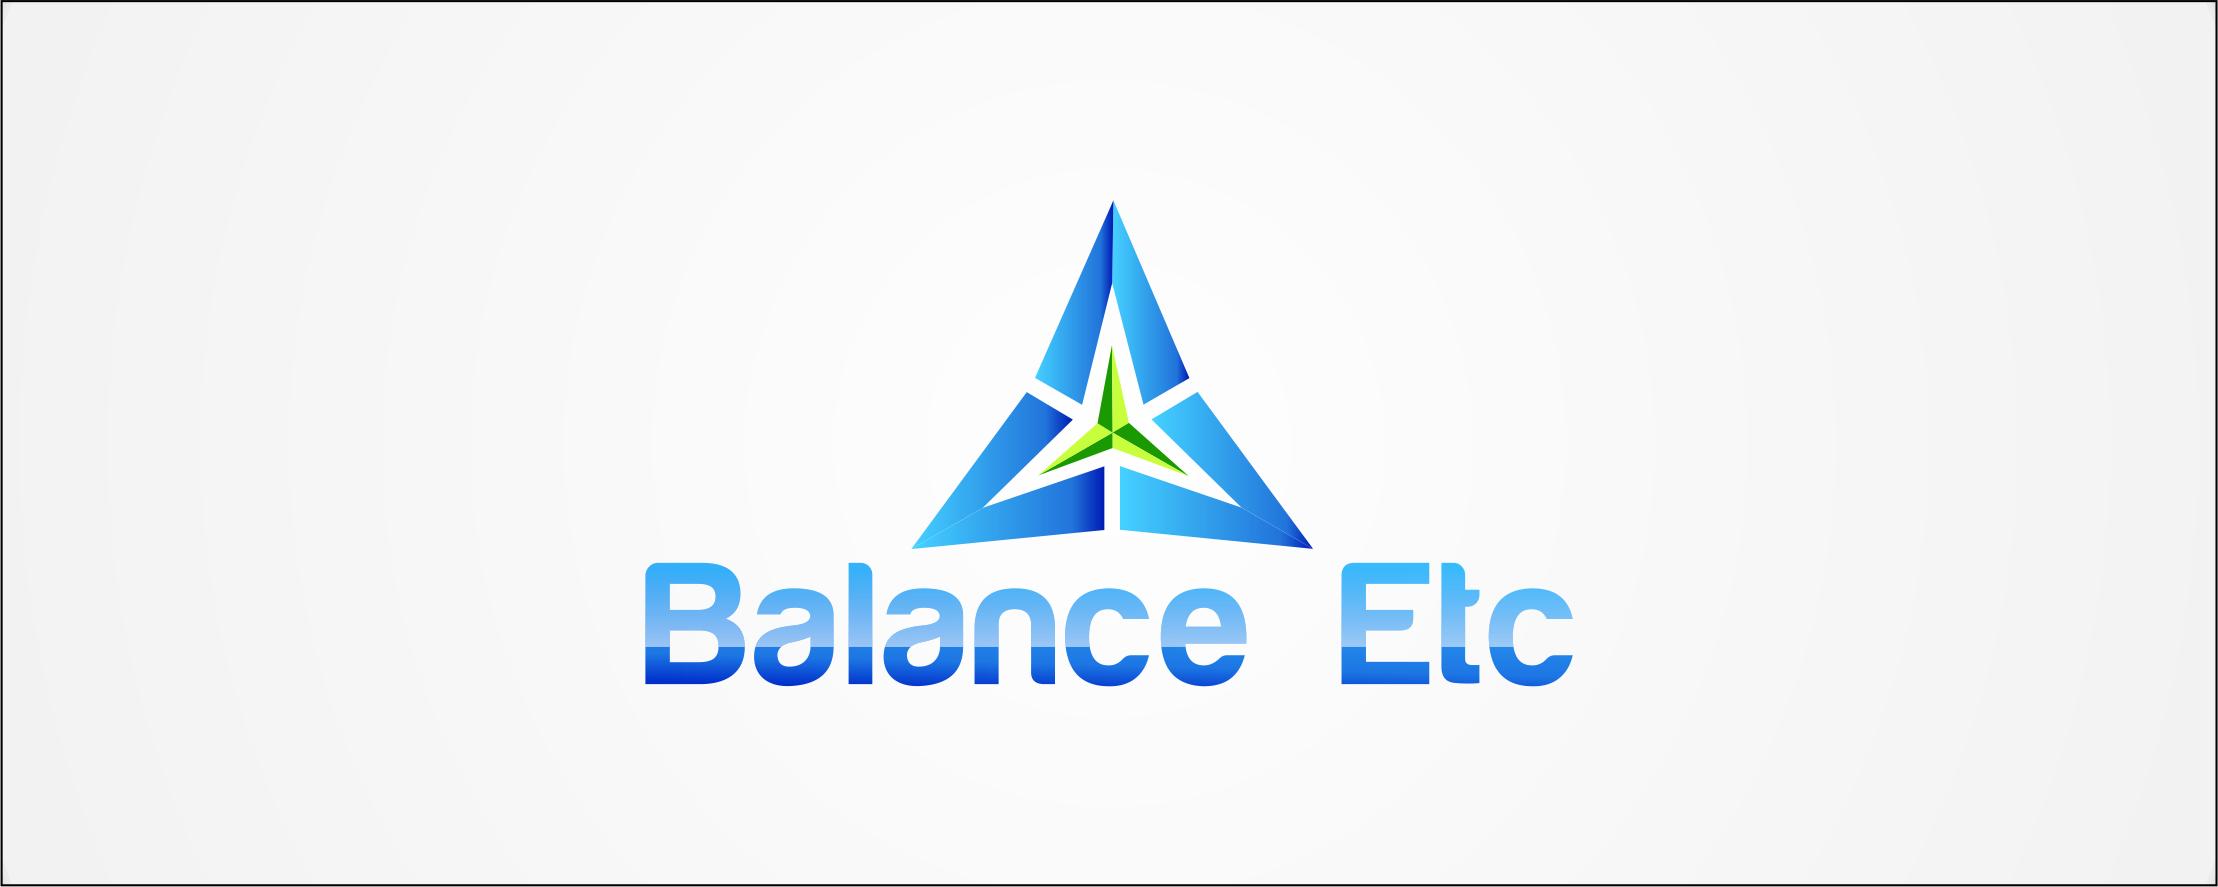 Balance_Etc.jpg